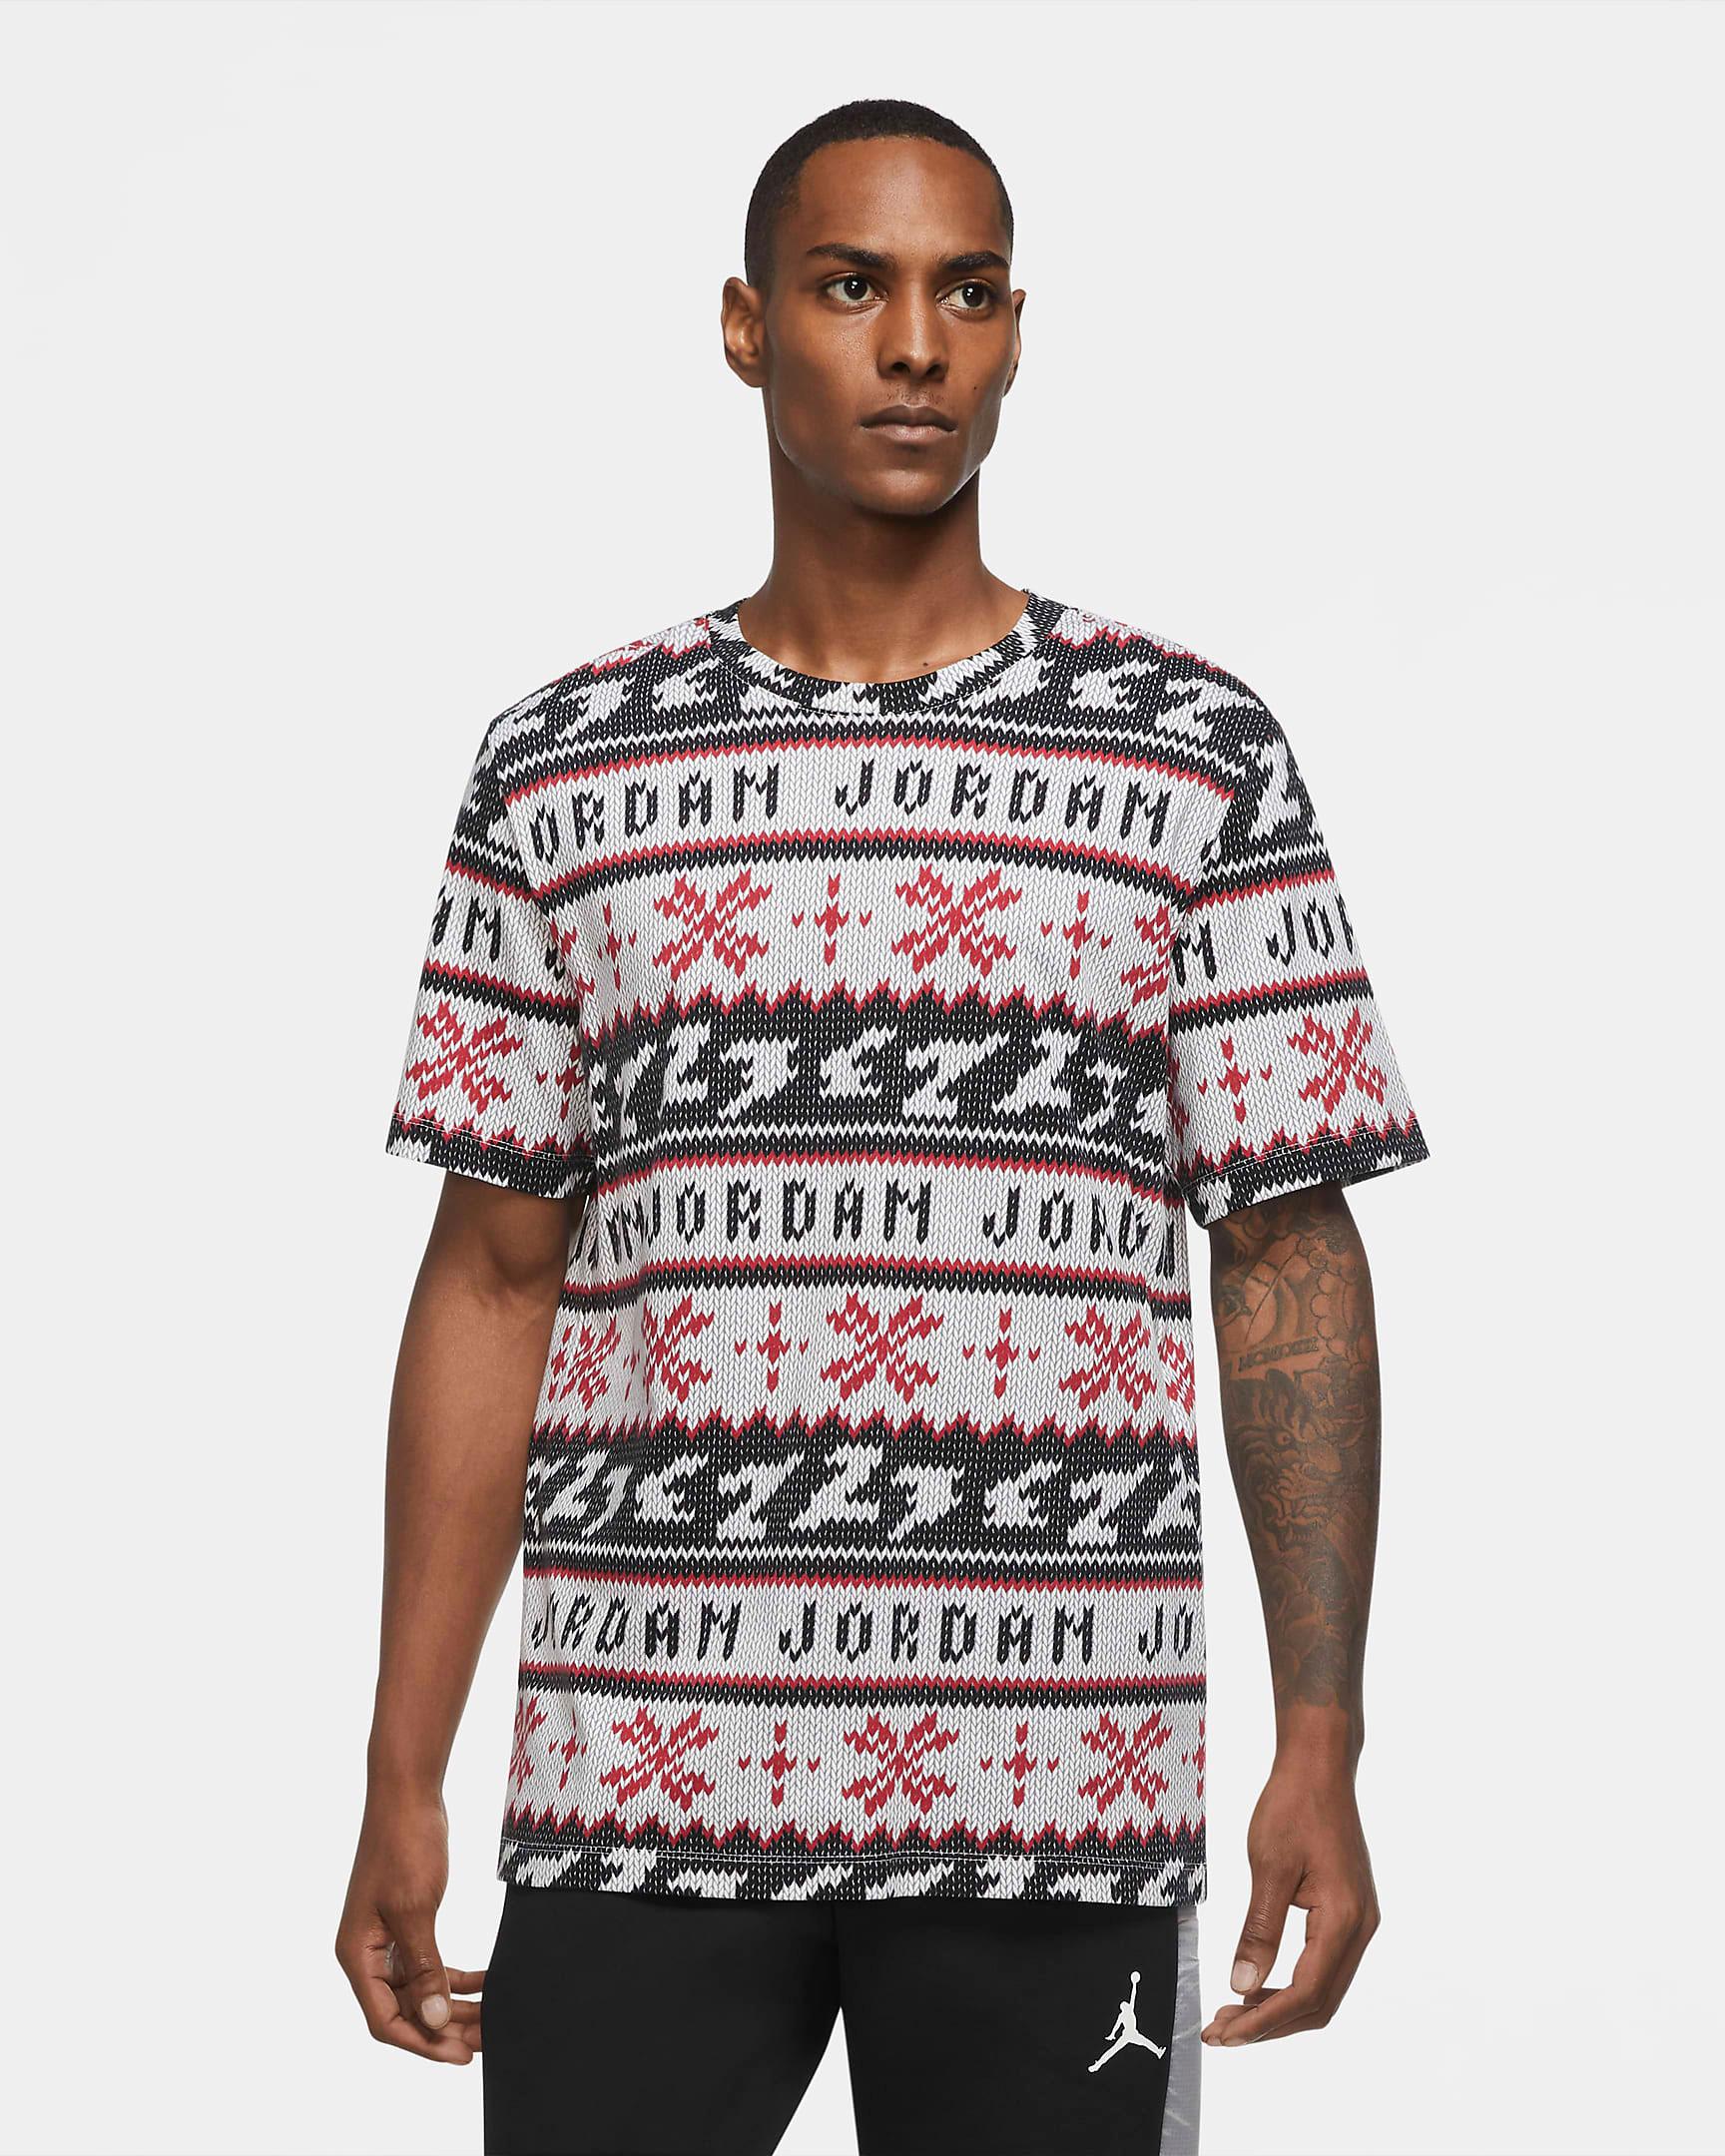 jordan-holiday-ugly-sweater-shirt-white-black-red